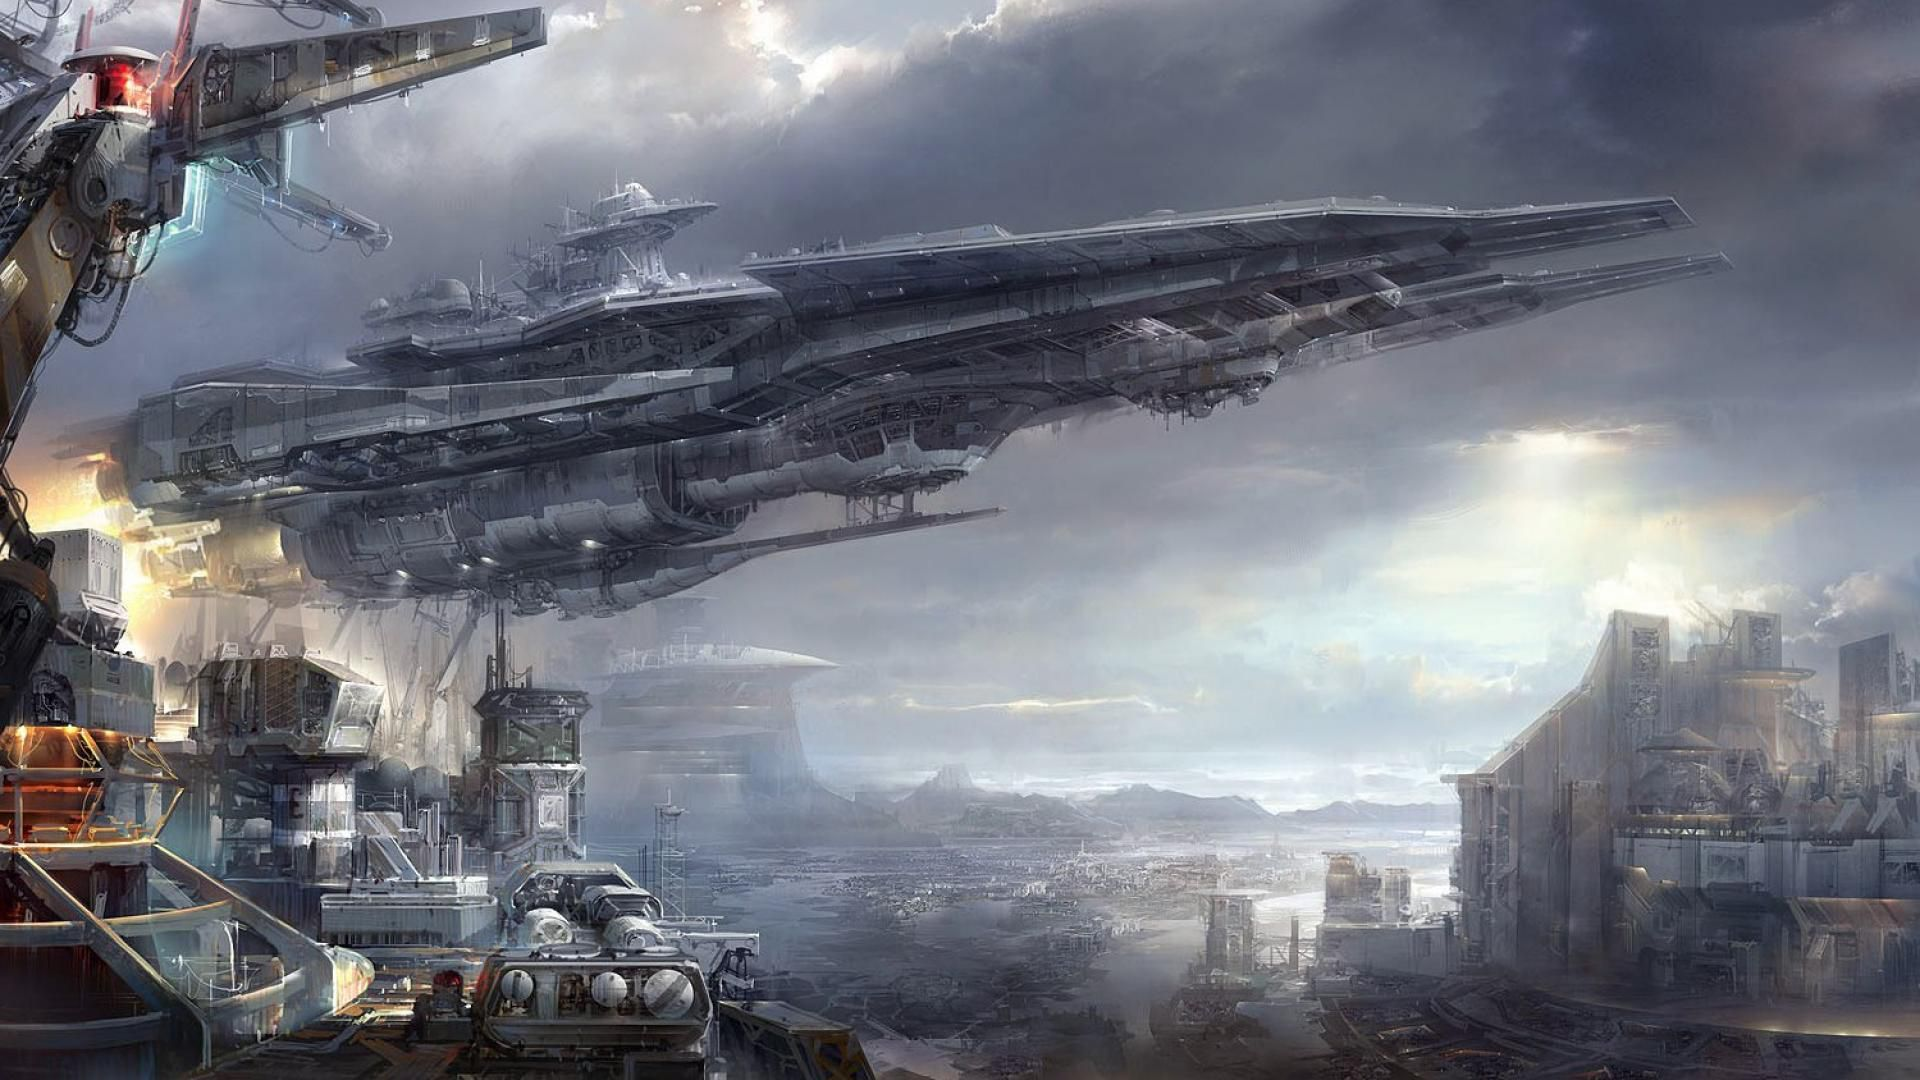 951 Spaceship Wallpapers Spaceship Backgrounds Spaceship Art Futuristic Art Sci Fi Art